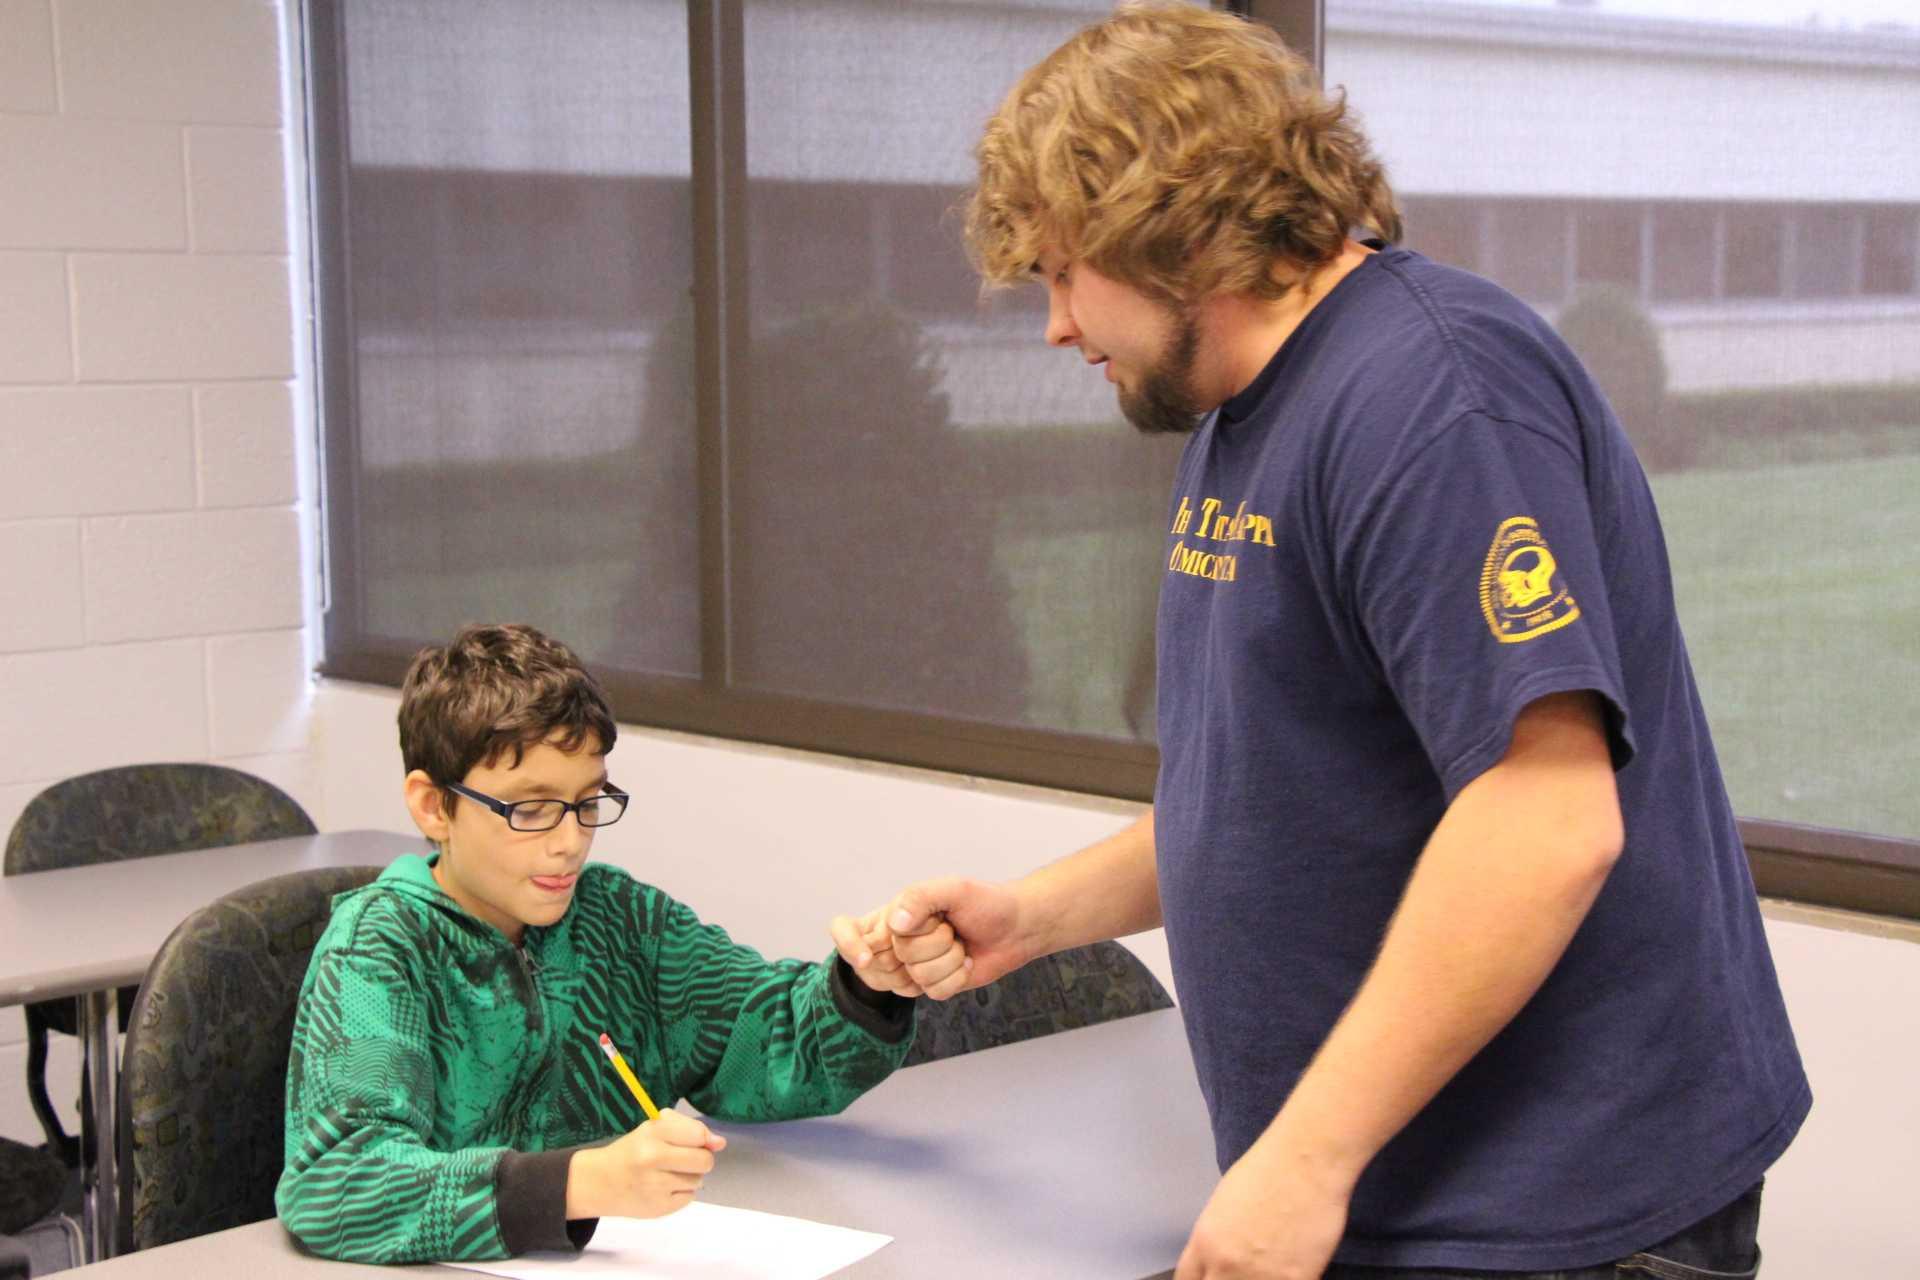 Steven Kliemann tutoring Middle School Student Jacob Sanders.